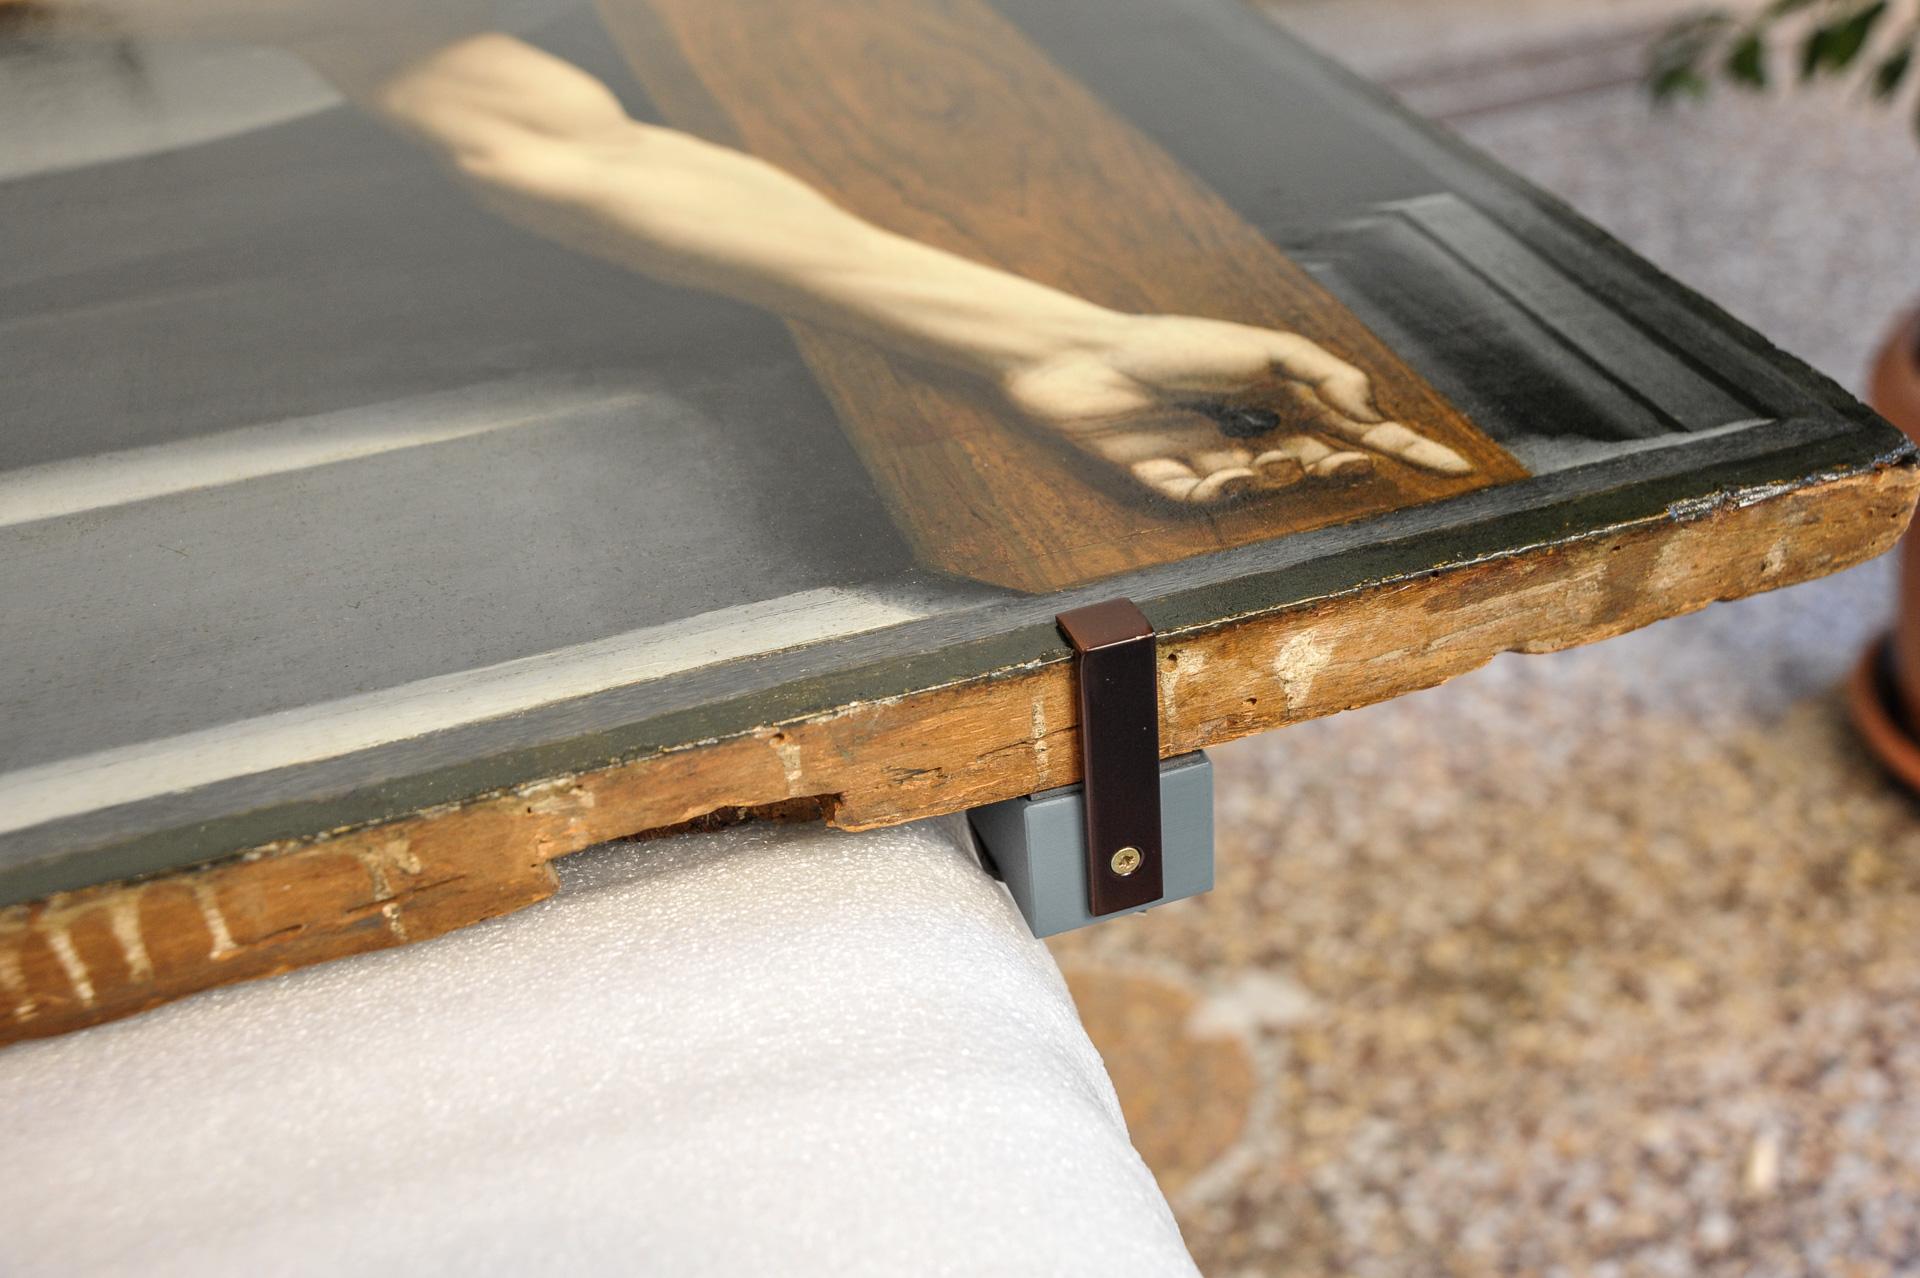 004-AtelierTournillon-Crucifixion-Bronzino